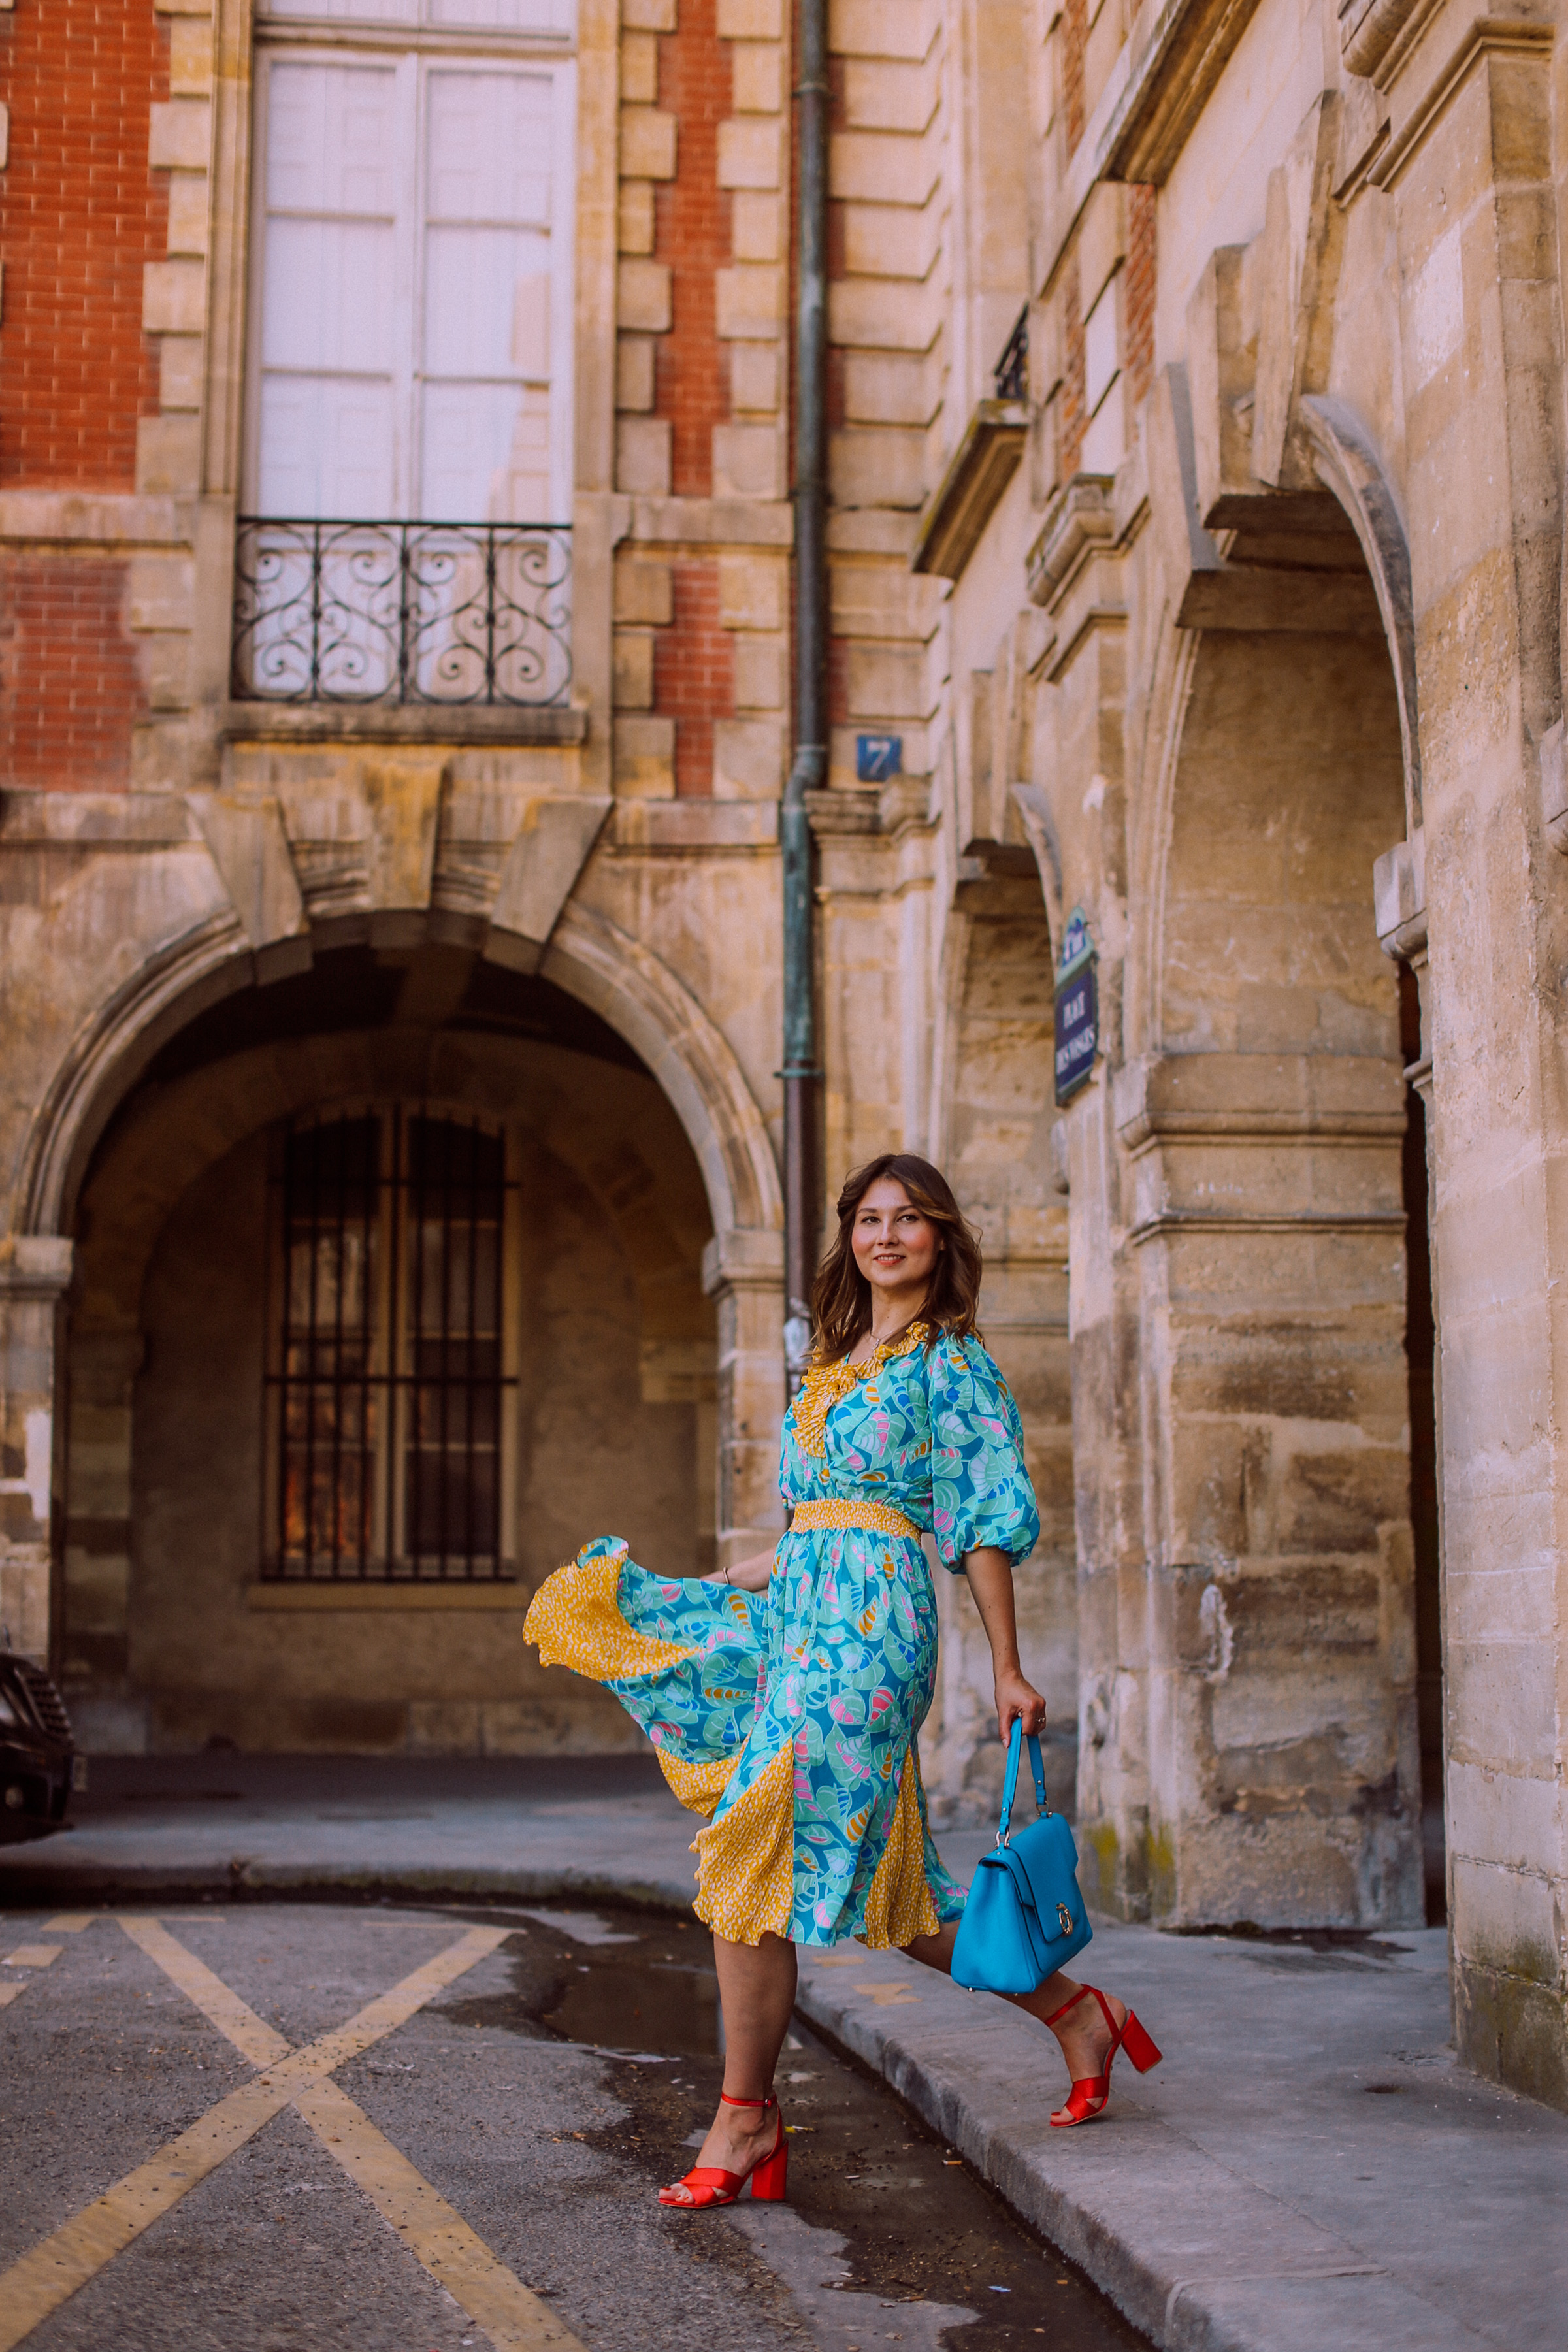 paris-vintage-dress-angelica-7182